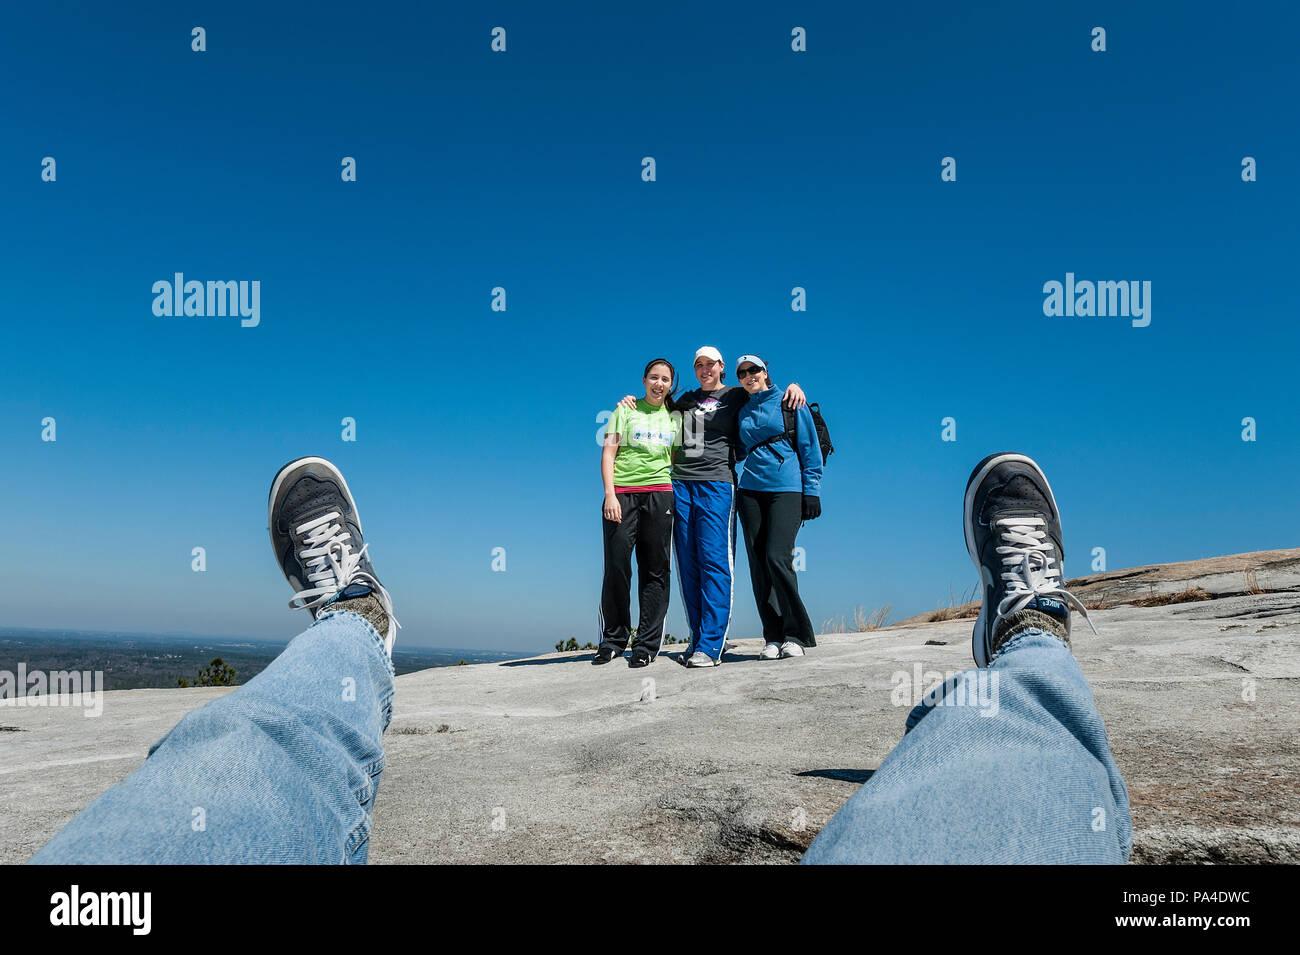 Selfie group snapshot, Stone Mountain, Georgia, USA. - Stock Image